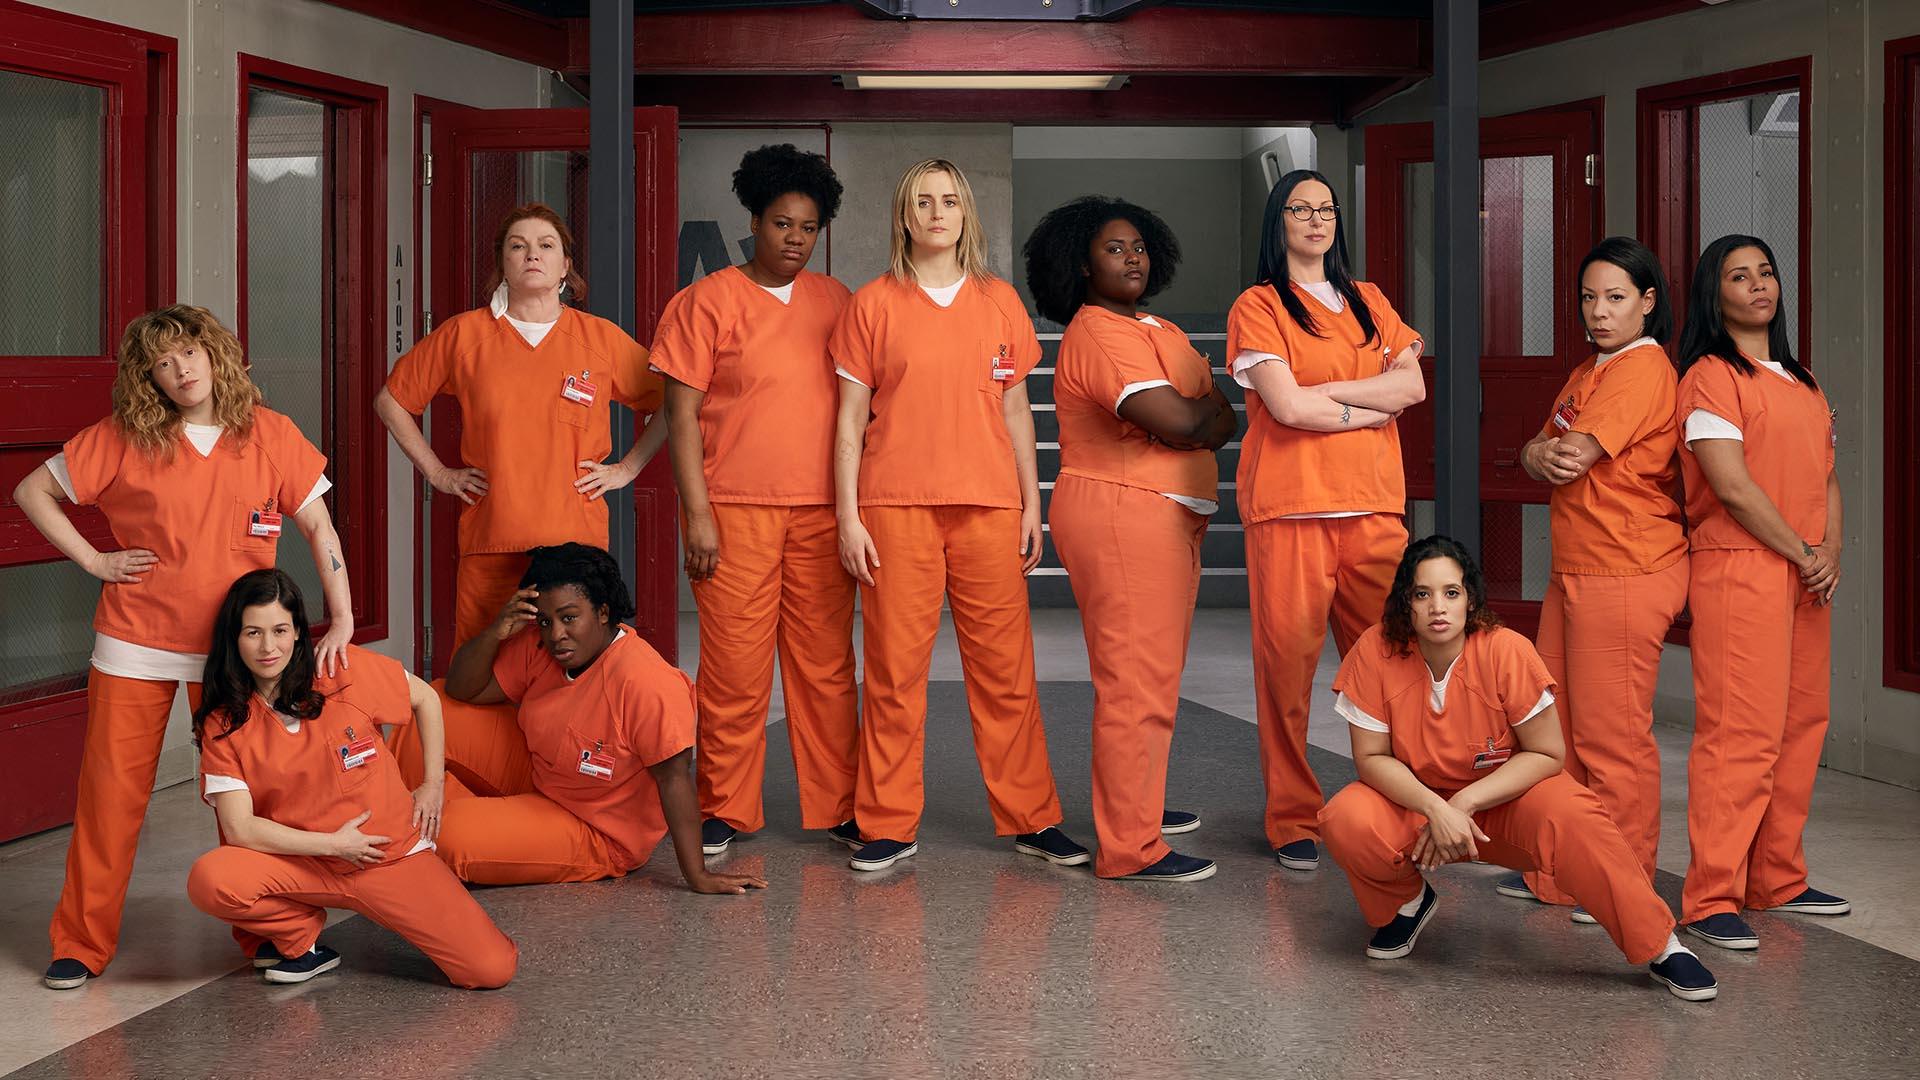 orange-is-the-new-black-season-6-shows-background-01.jpg